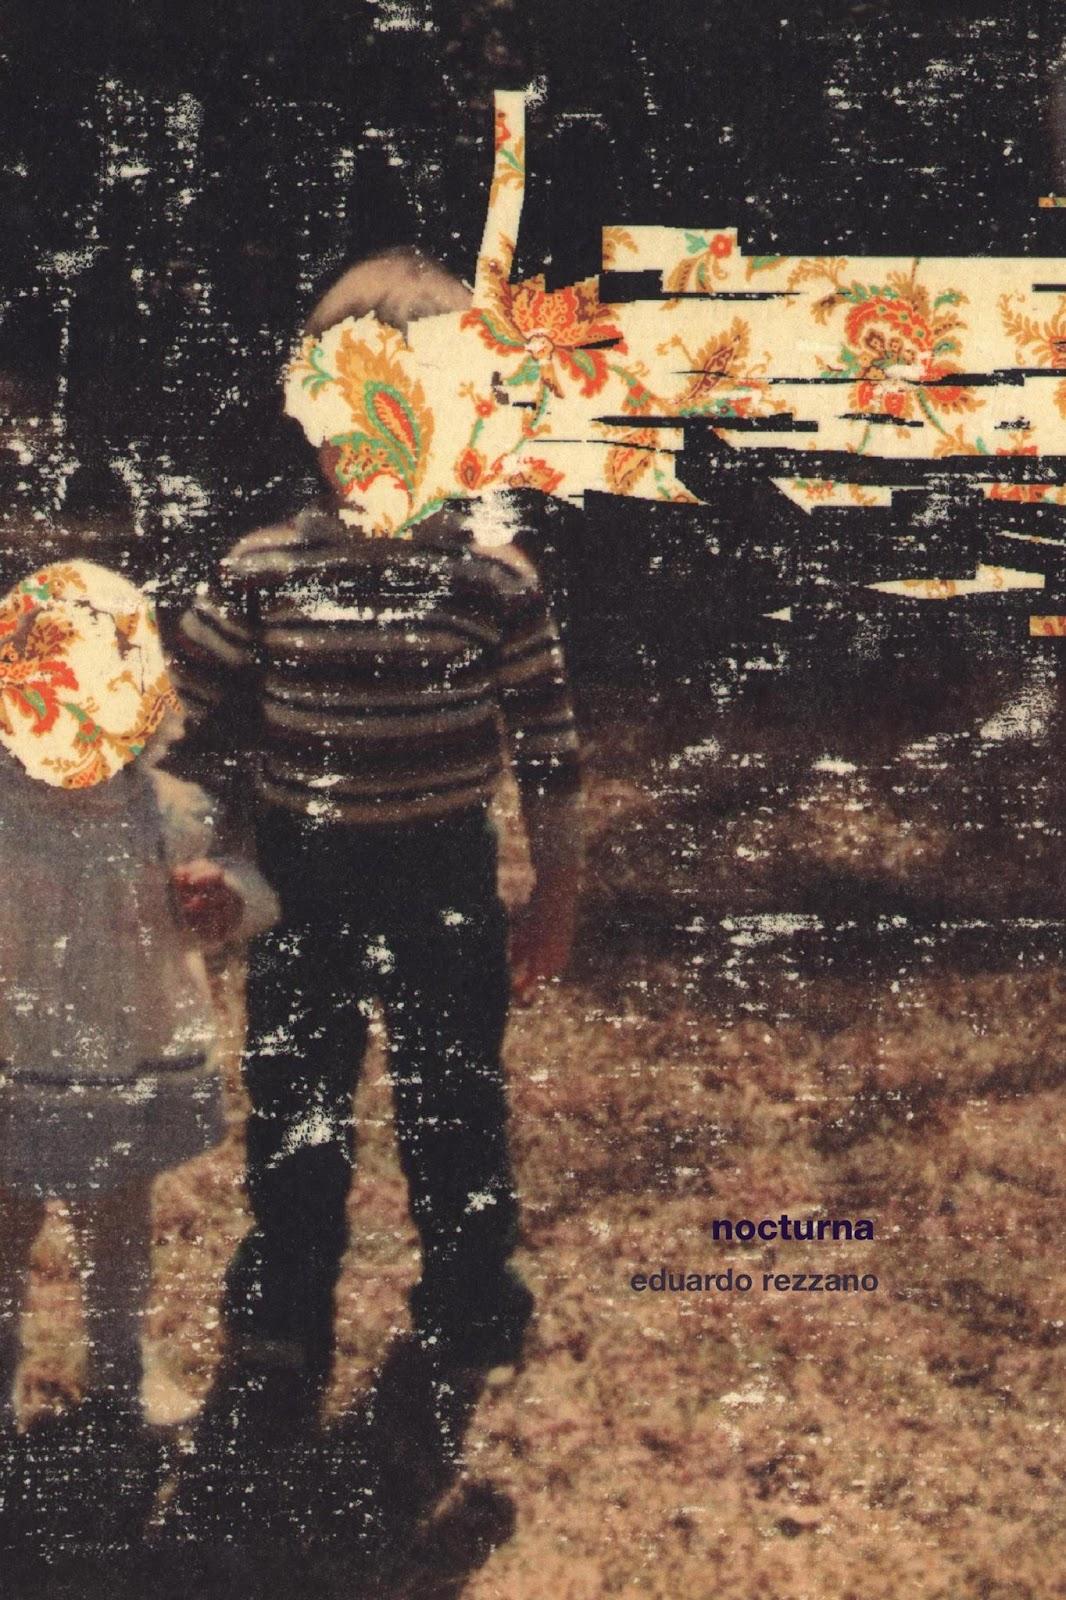 Eduardo Rezzano - Nocturna.jpg